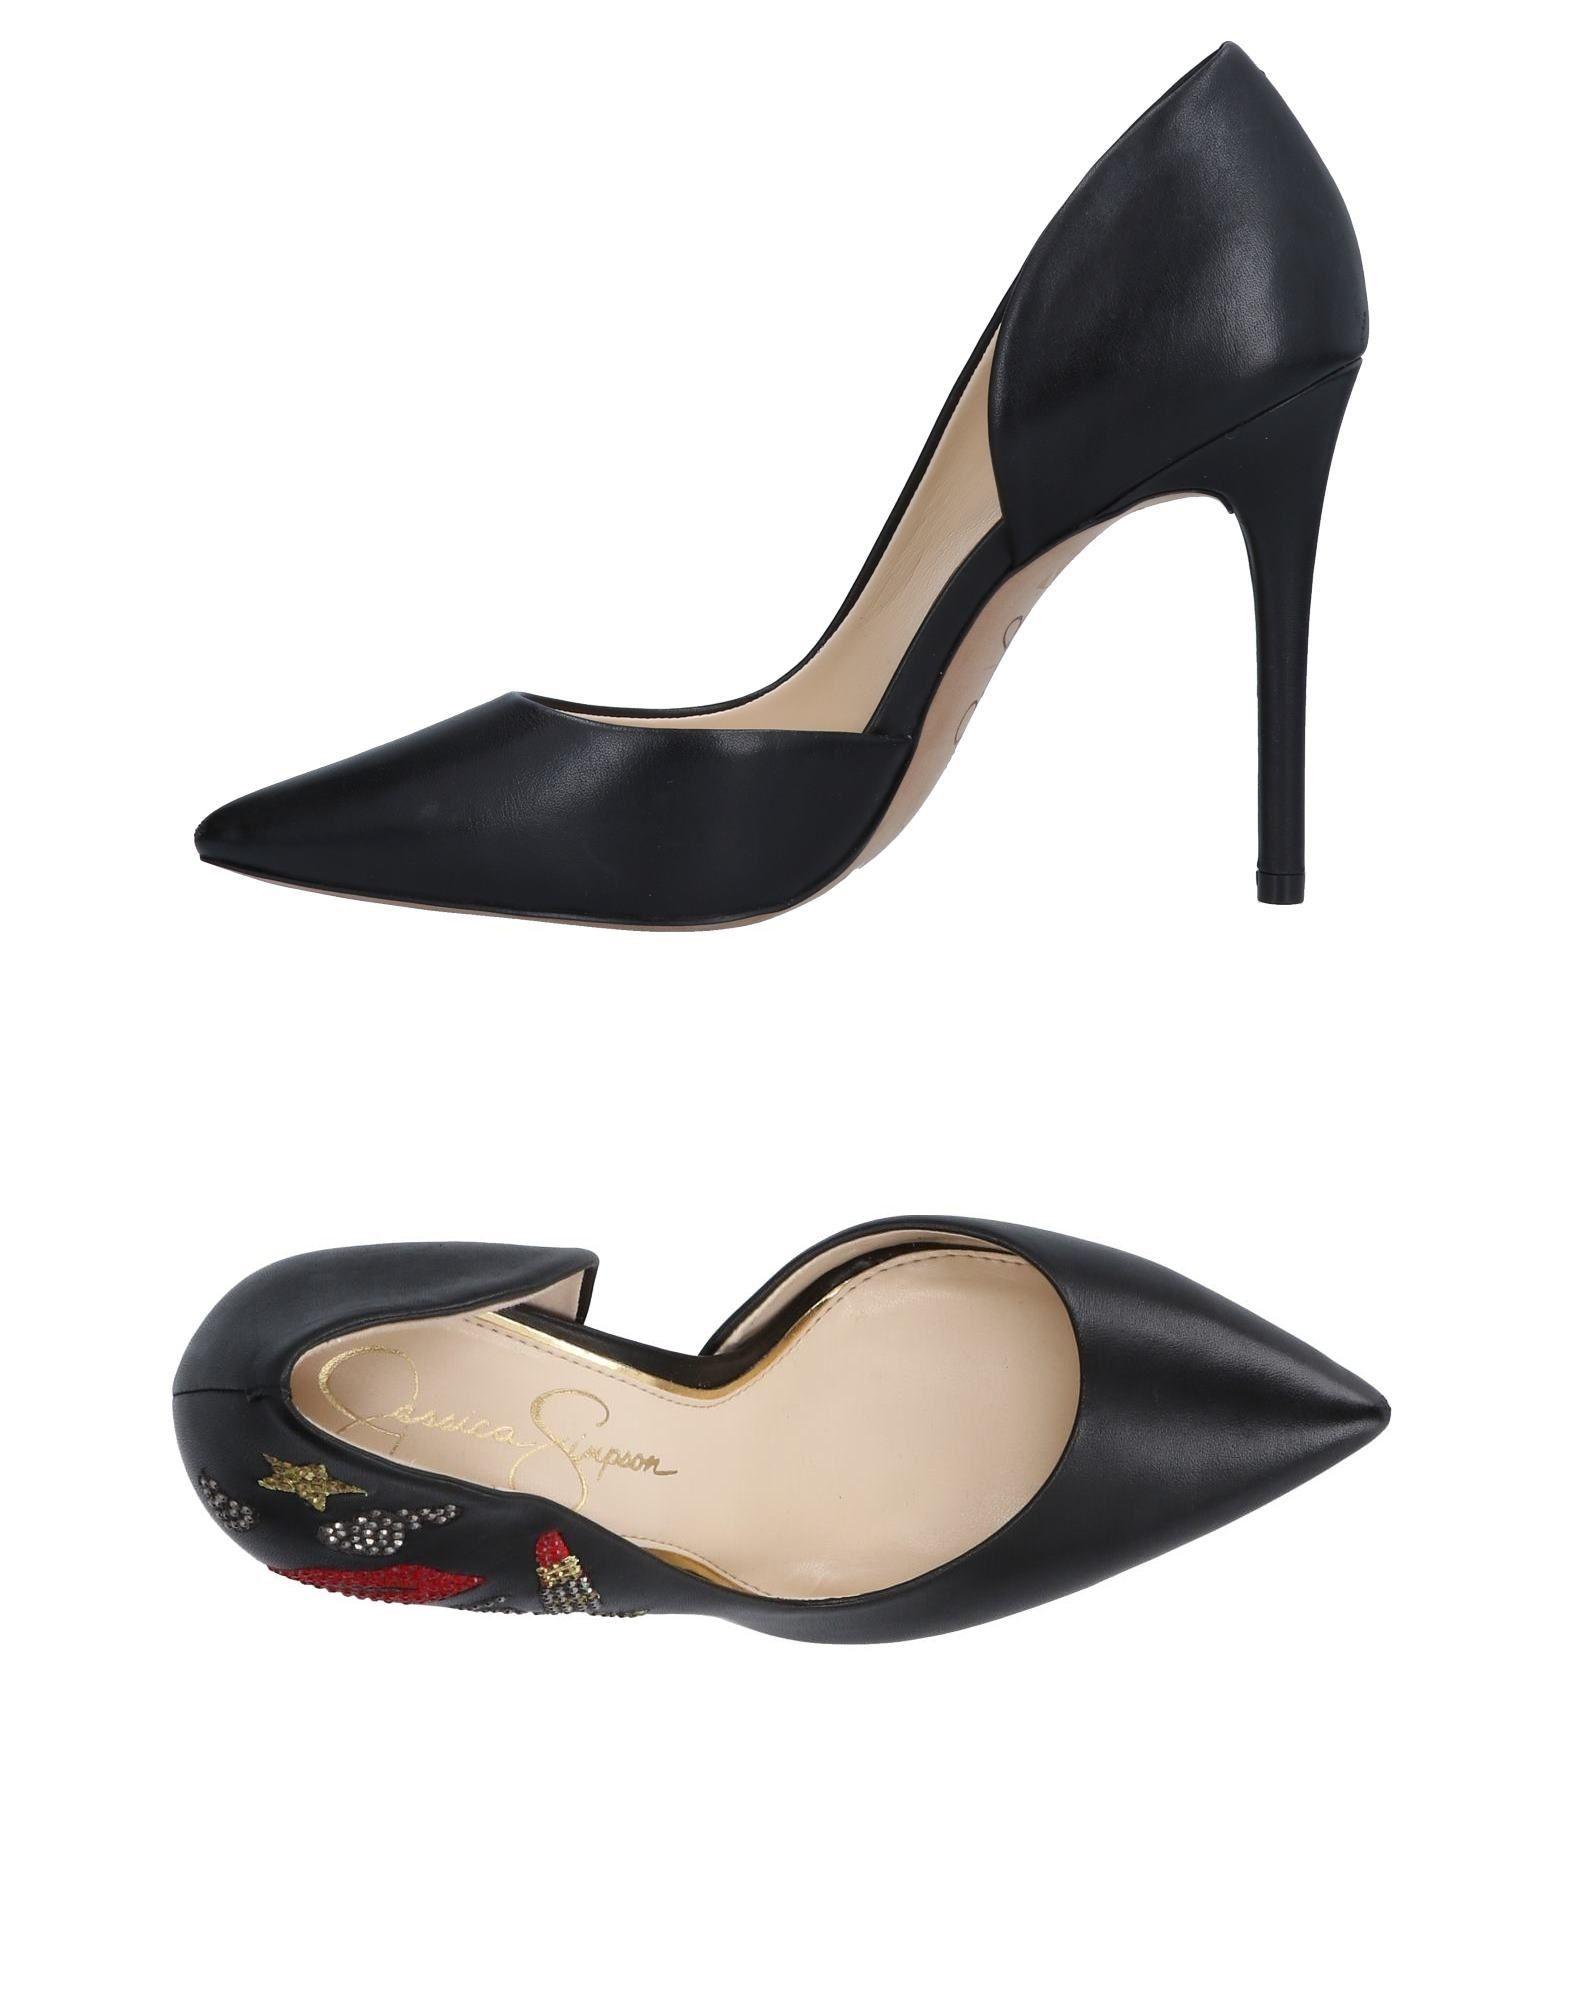 Jessica Simpson Pumps Qualität Damen  11501826UJ Gute Qualität Pumps beliebte Schuhe c89c21